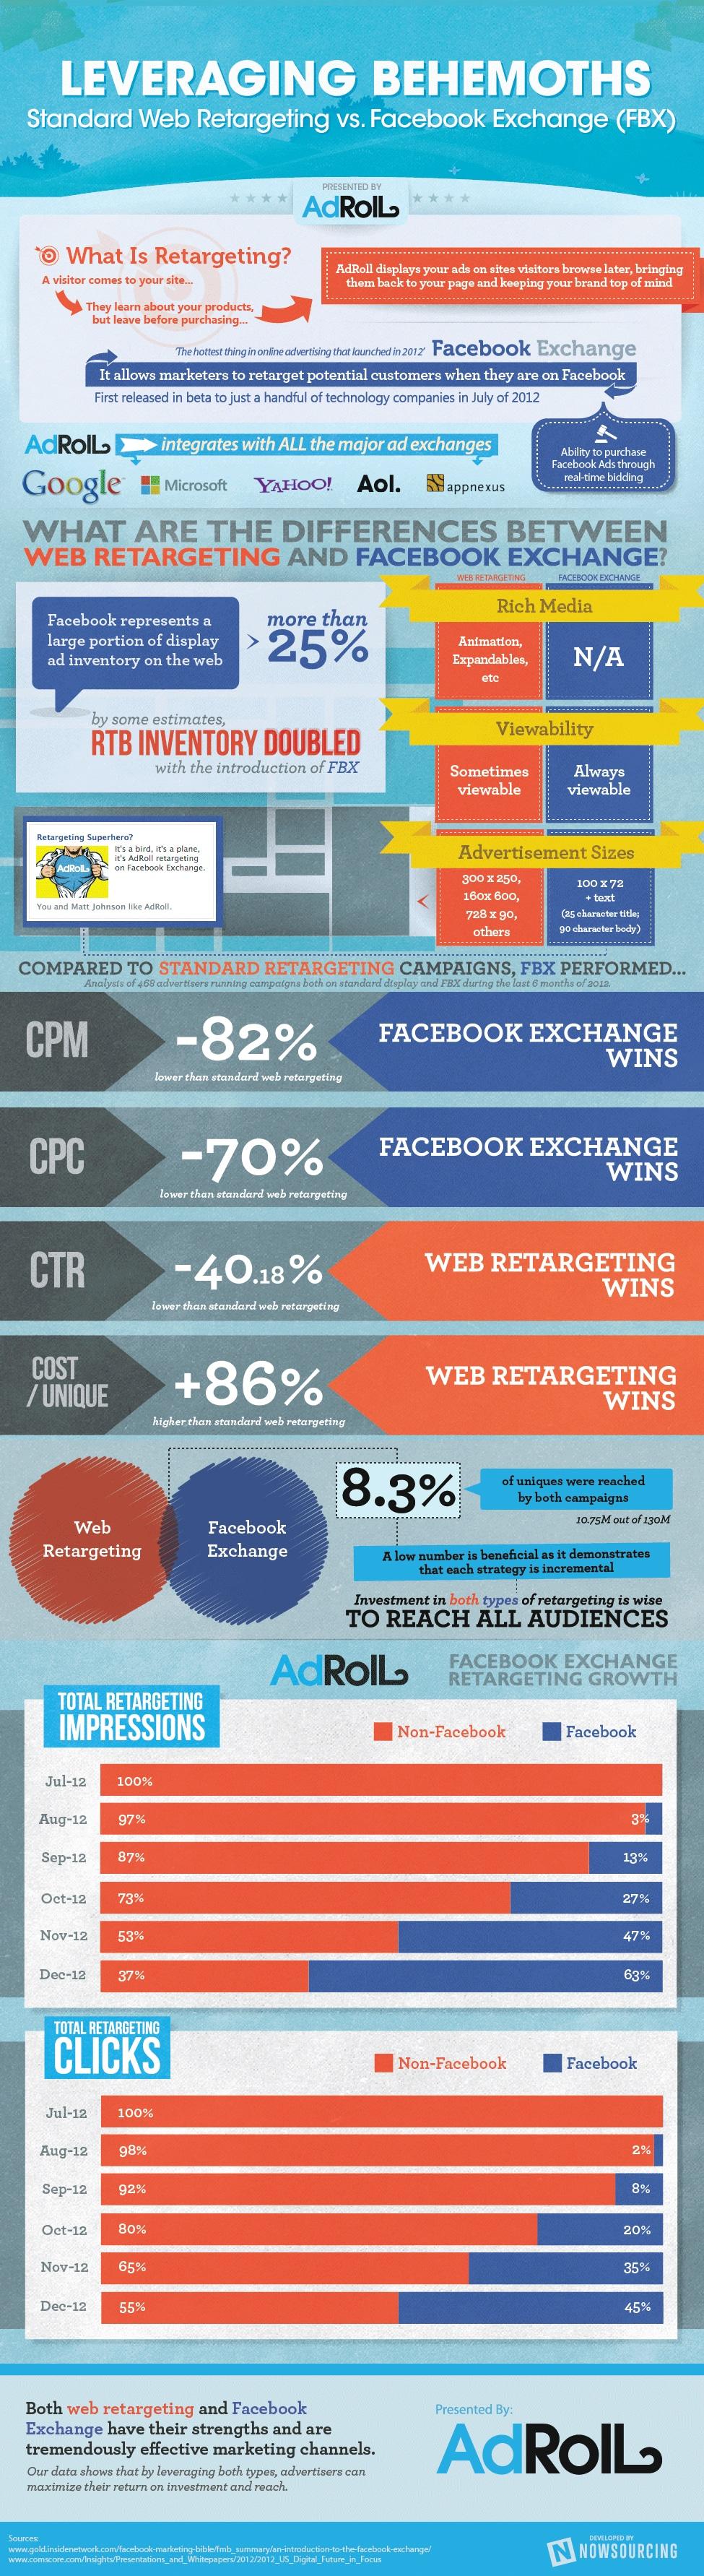 facebook-exchange-retargeted-ads-infographic